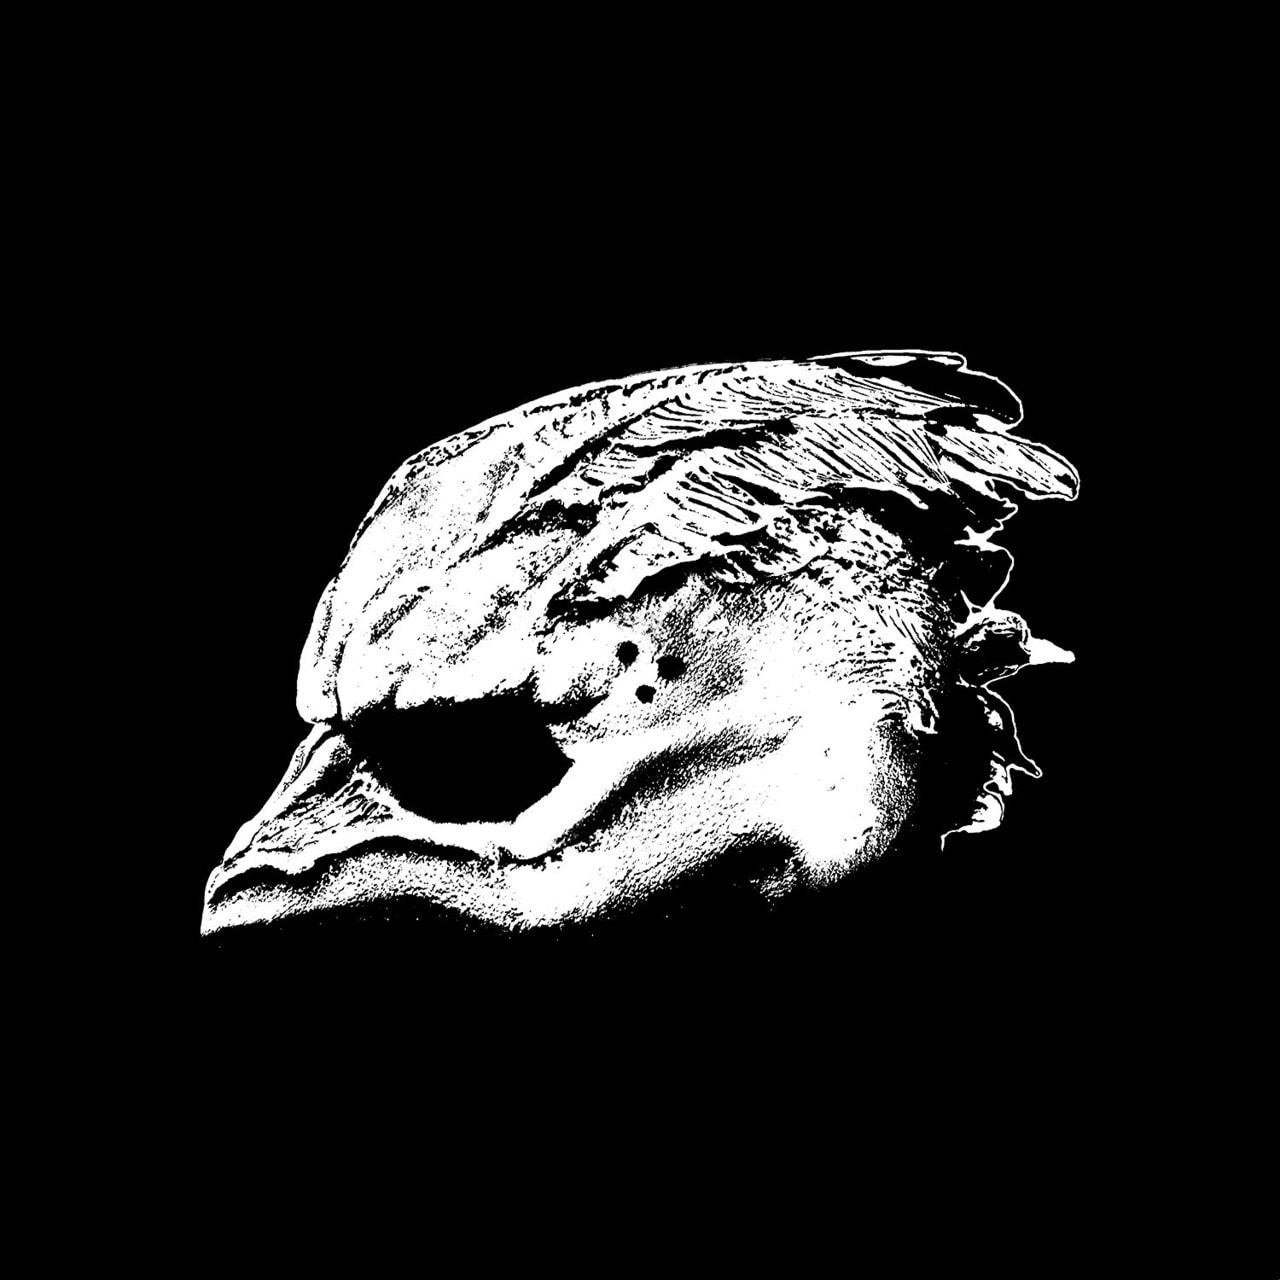 Legend of the Seagullmen - 1